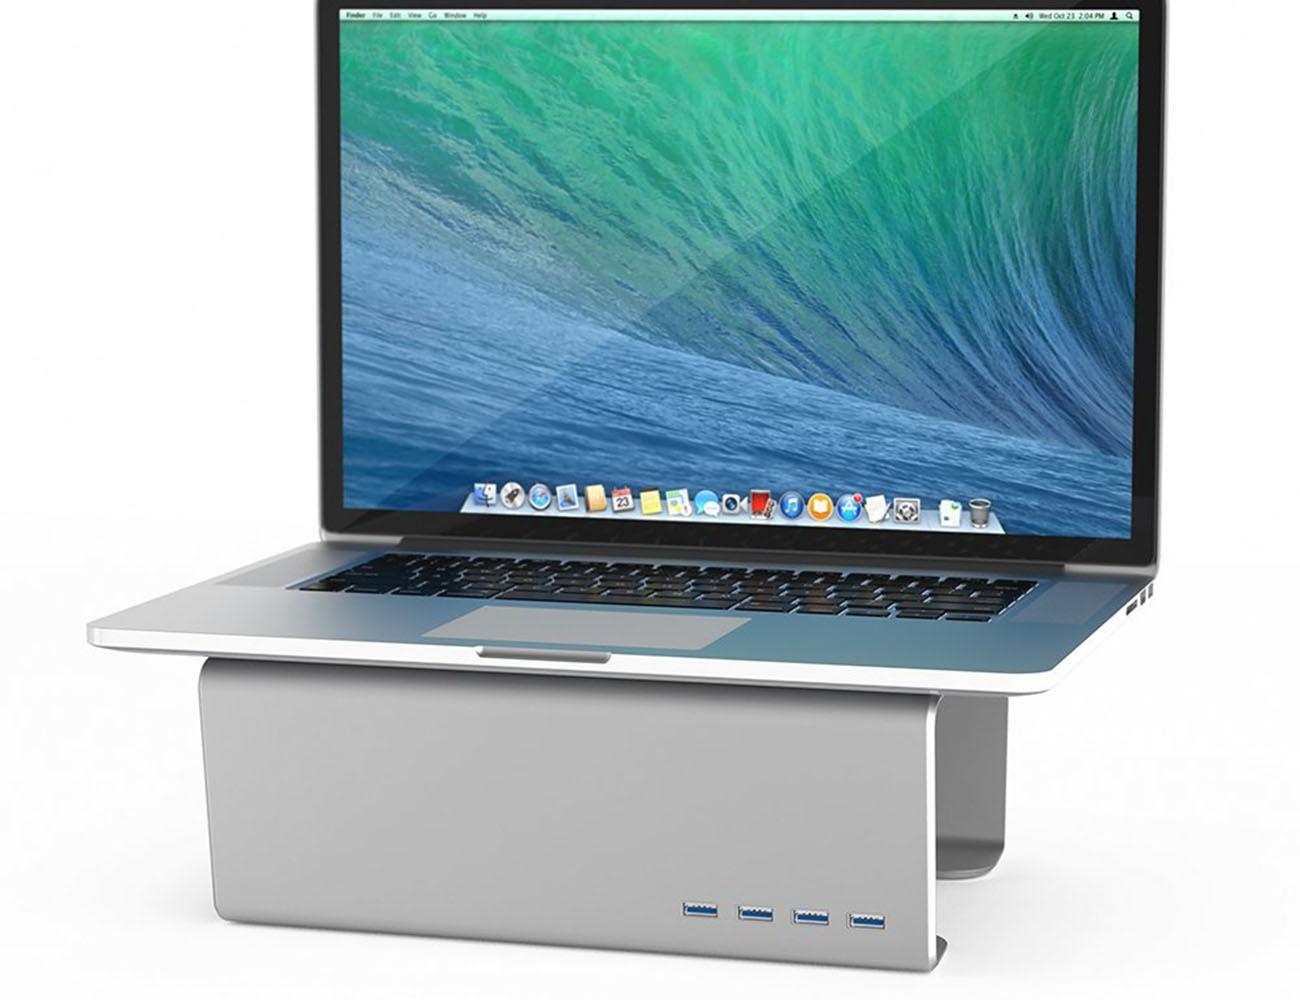 Premium Aluminum Monitor Stand And Four Port Usb 30 Hub